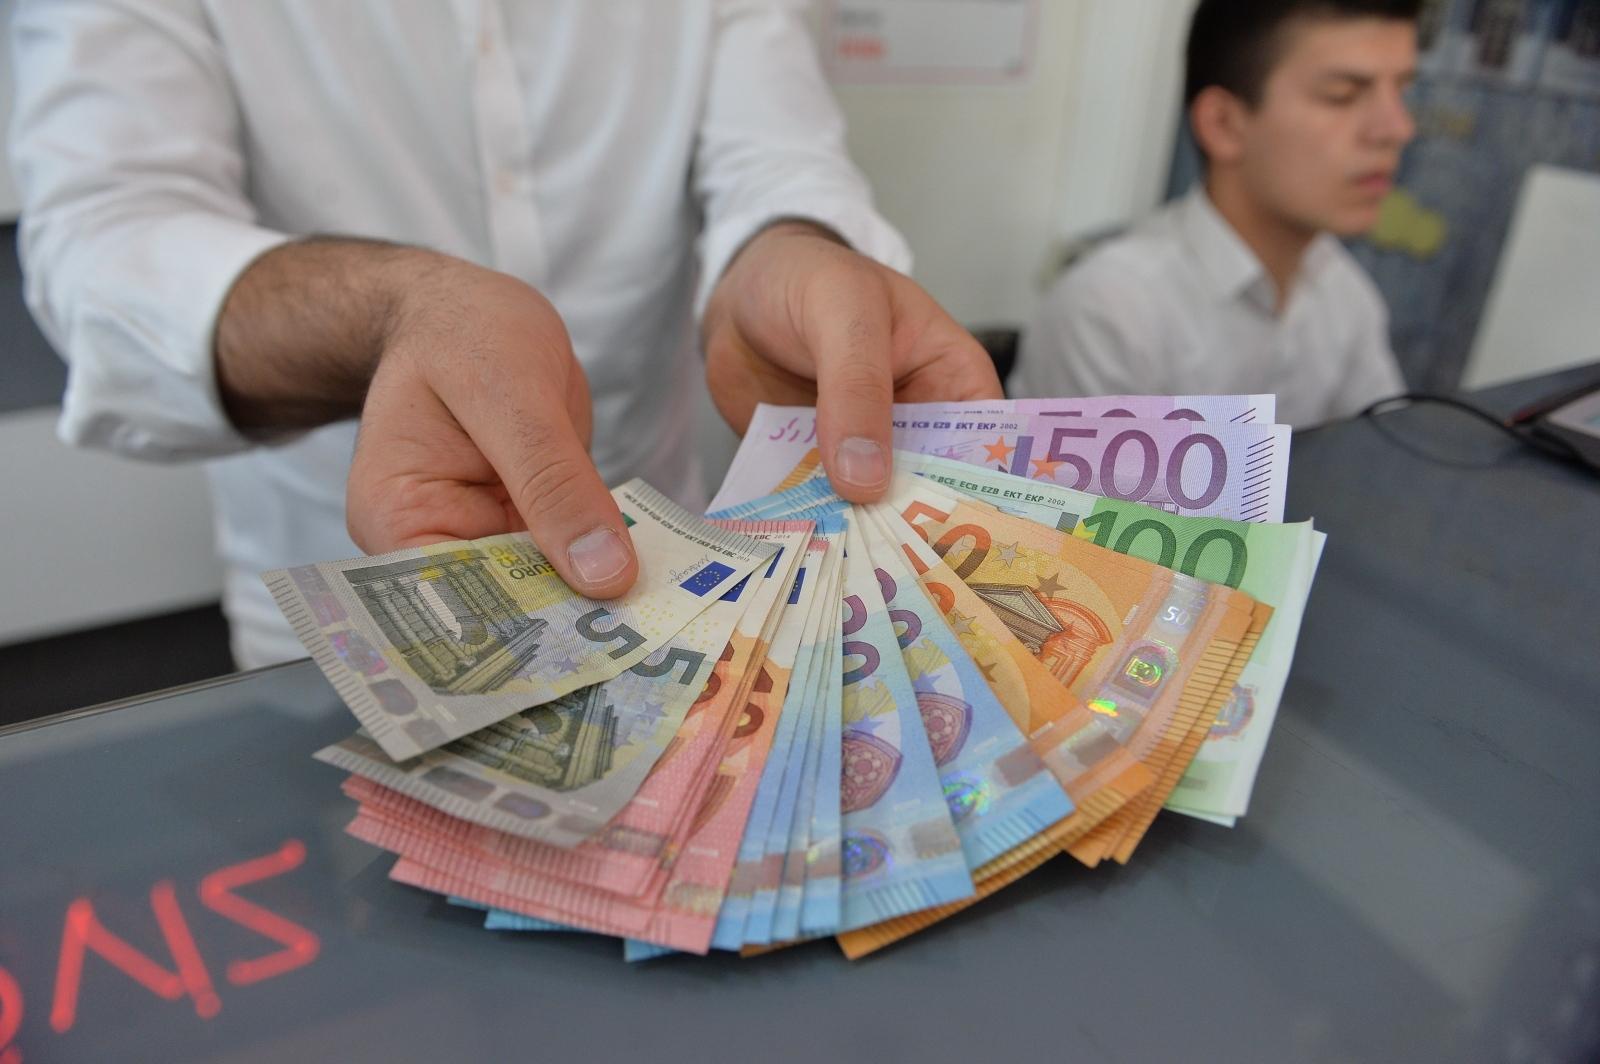 Evro - bankovci Vir:Pixell